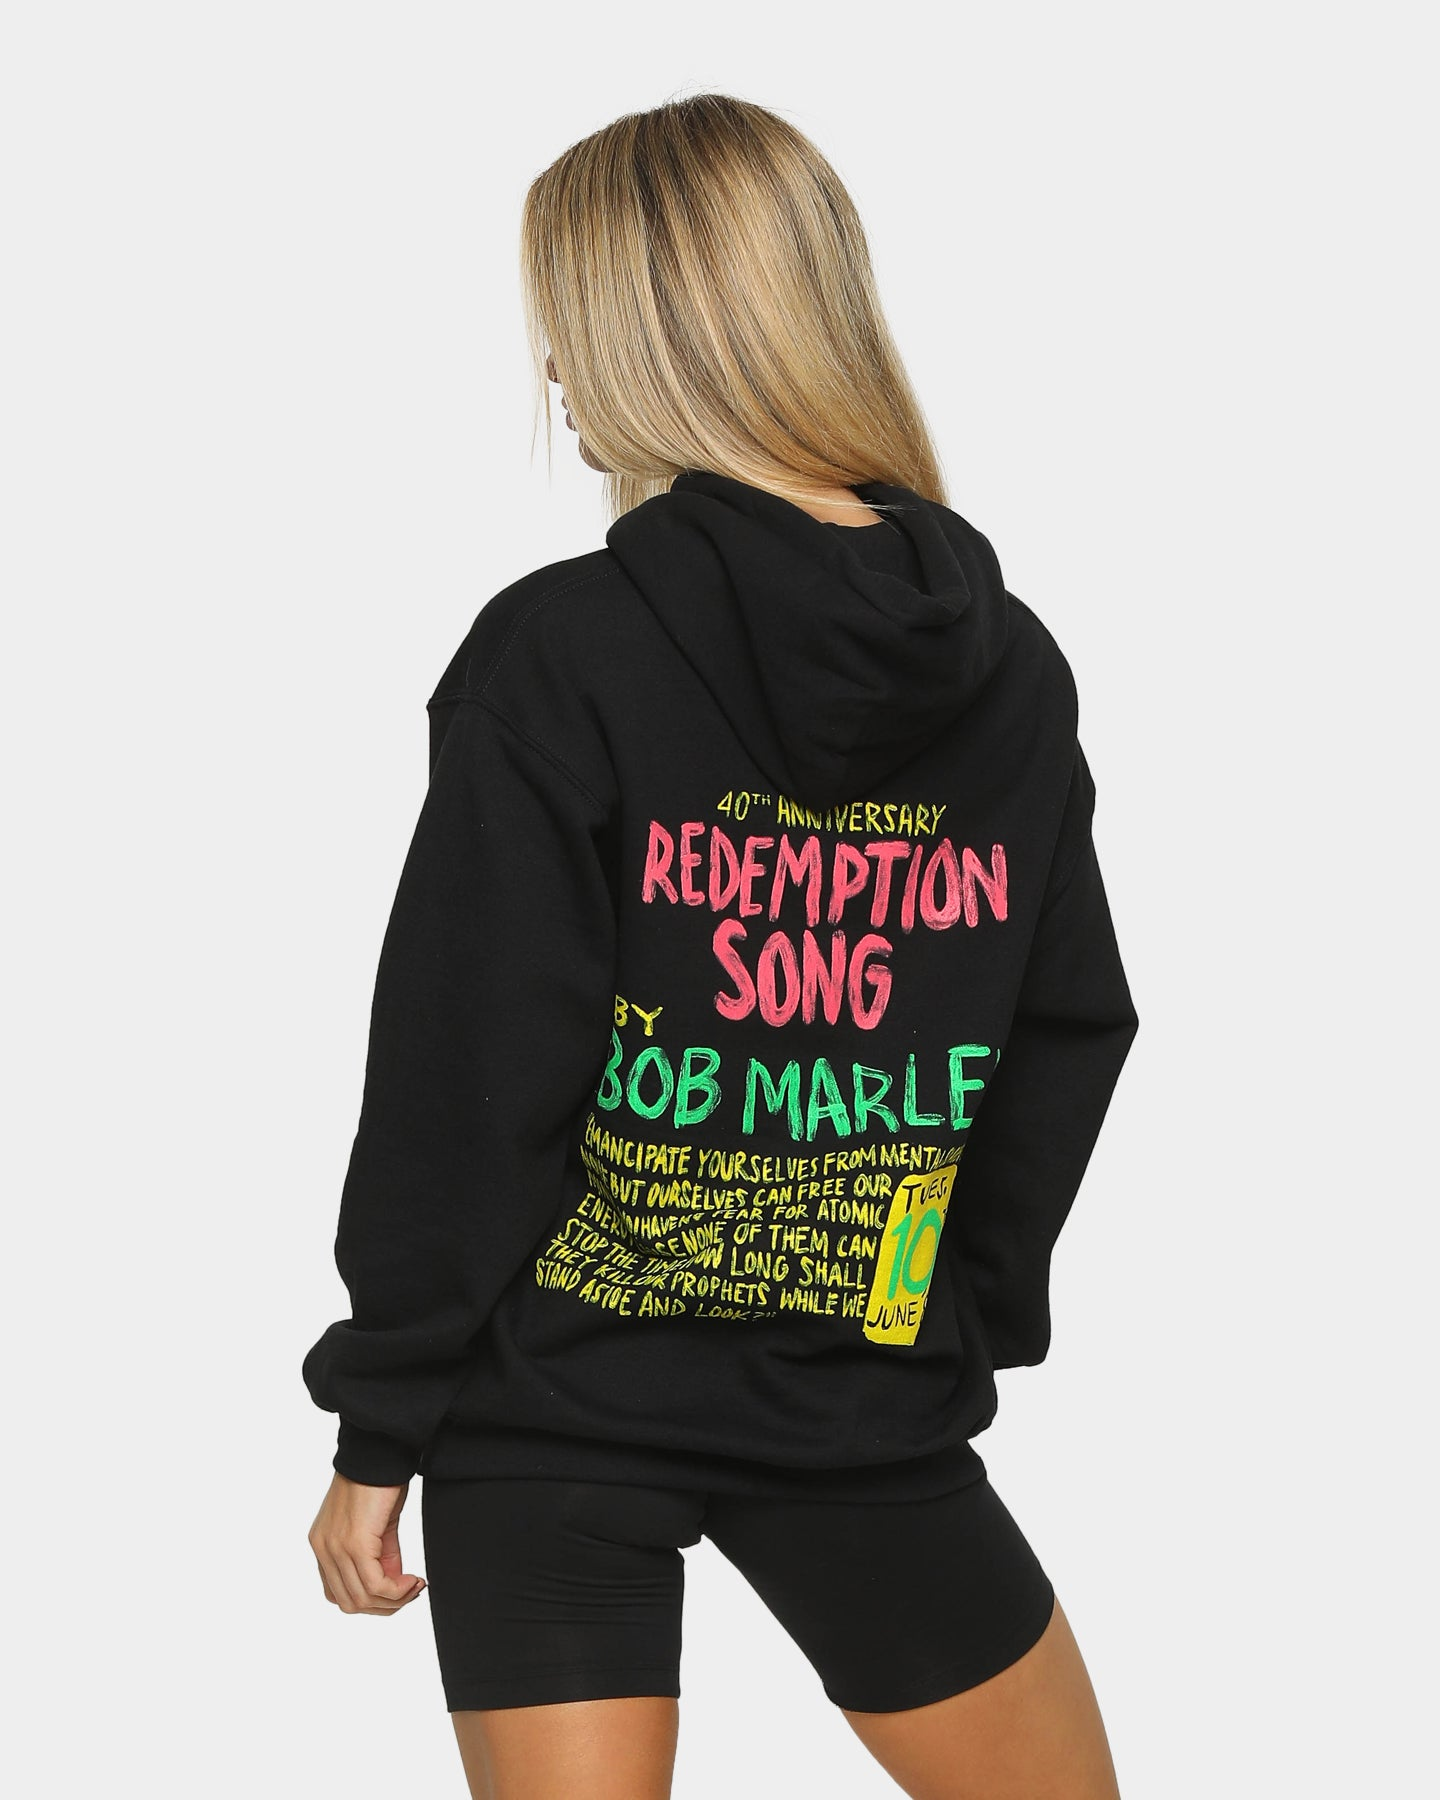 Bob Marley Mens Jacket Black